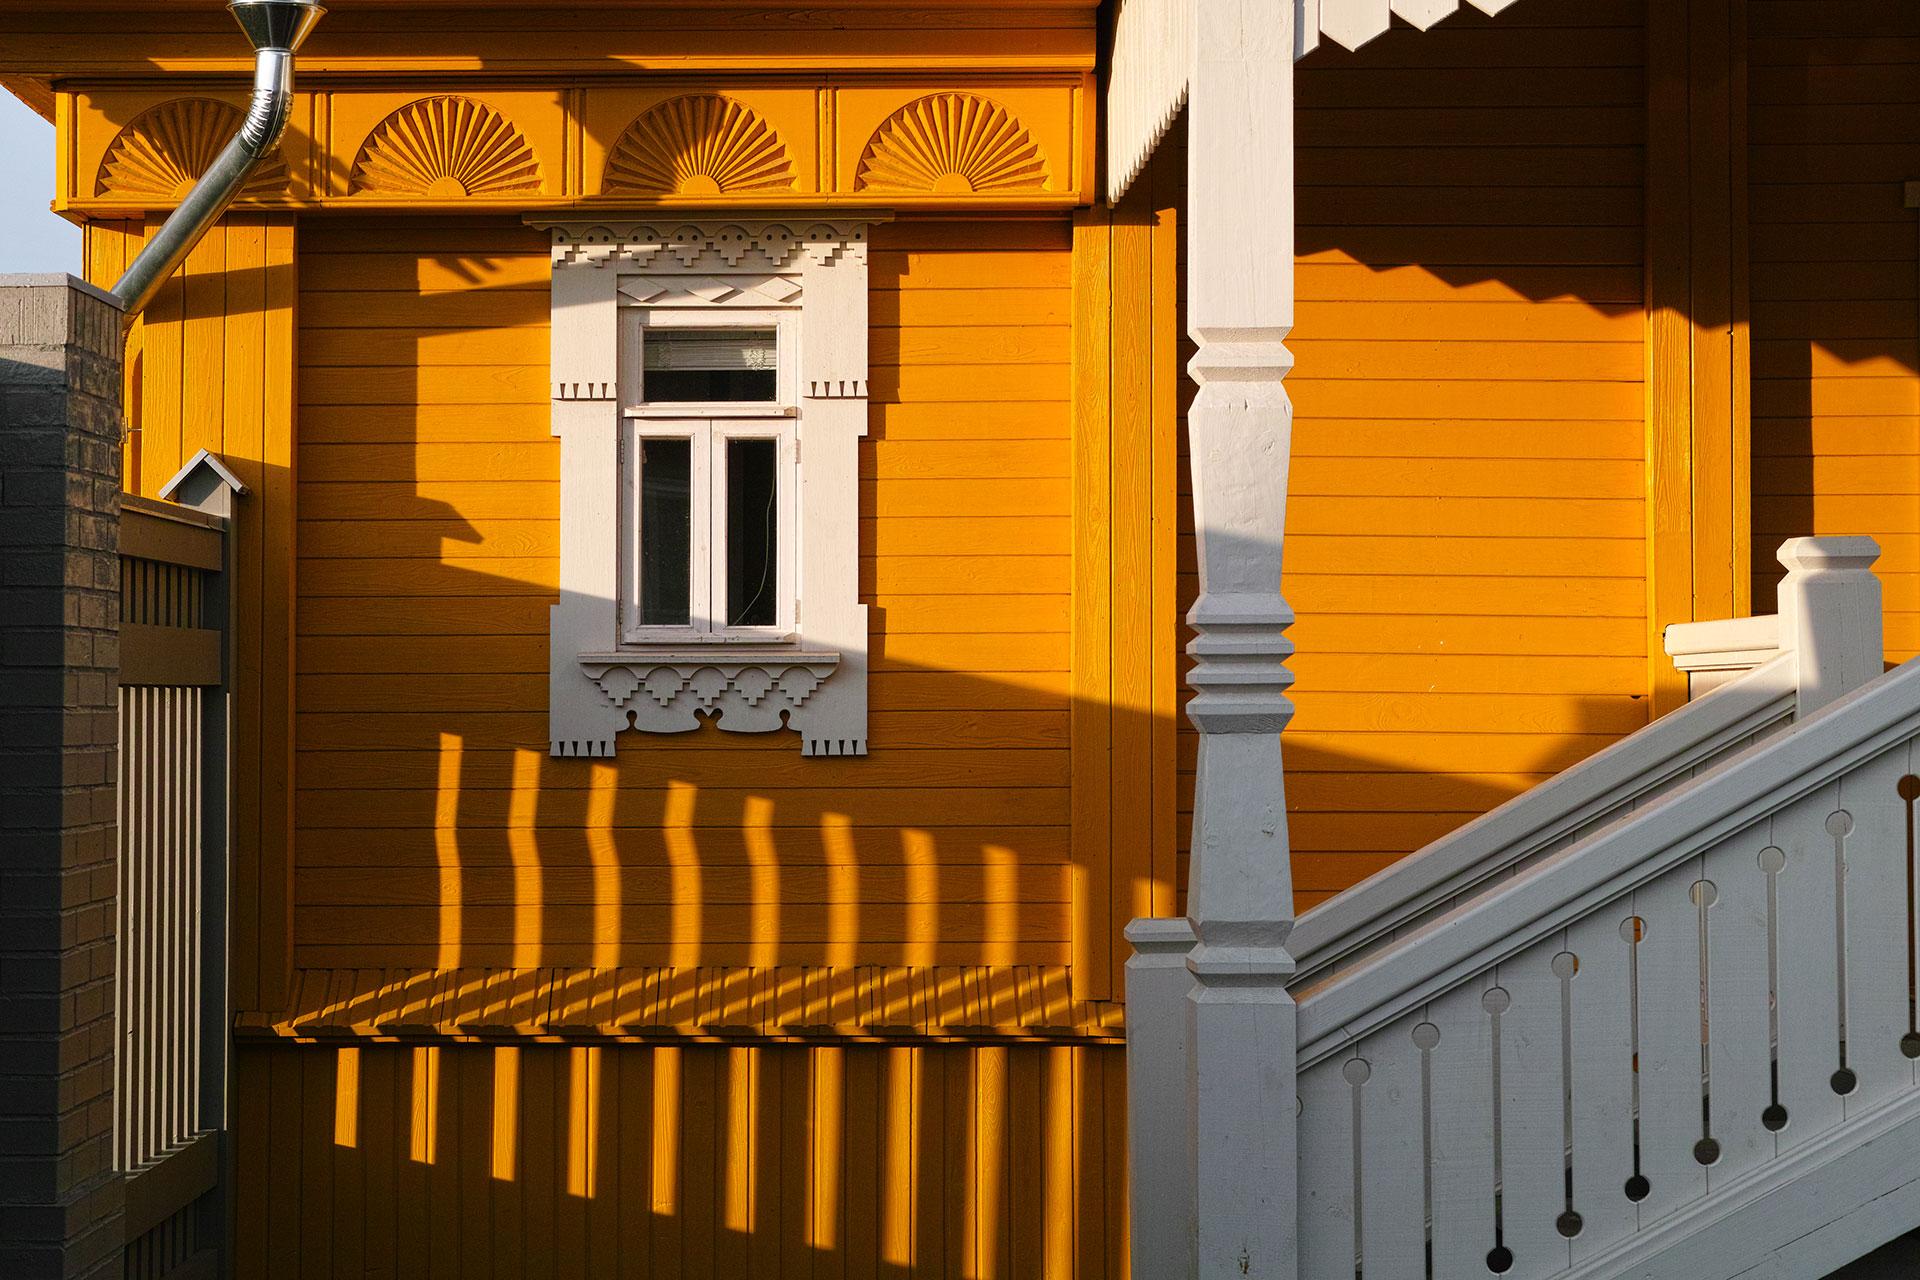 Suzdal Dacha by FORM Bureau. Photo by Yuri Palmin.